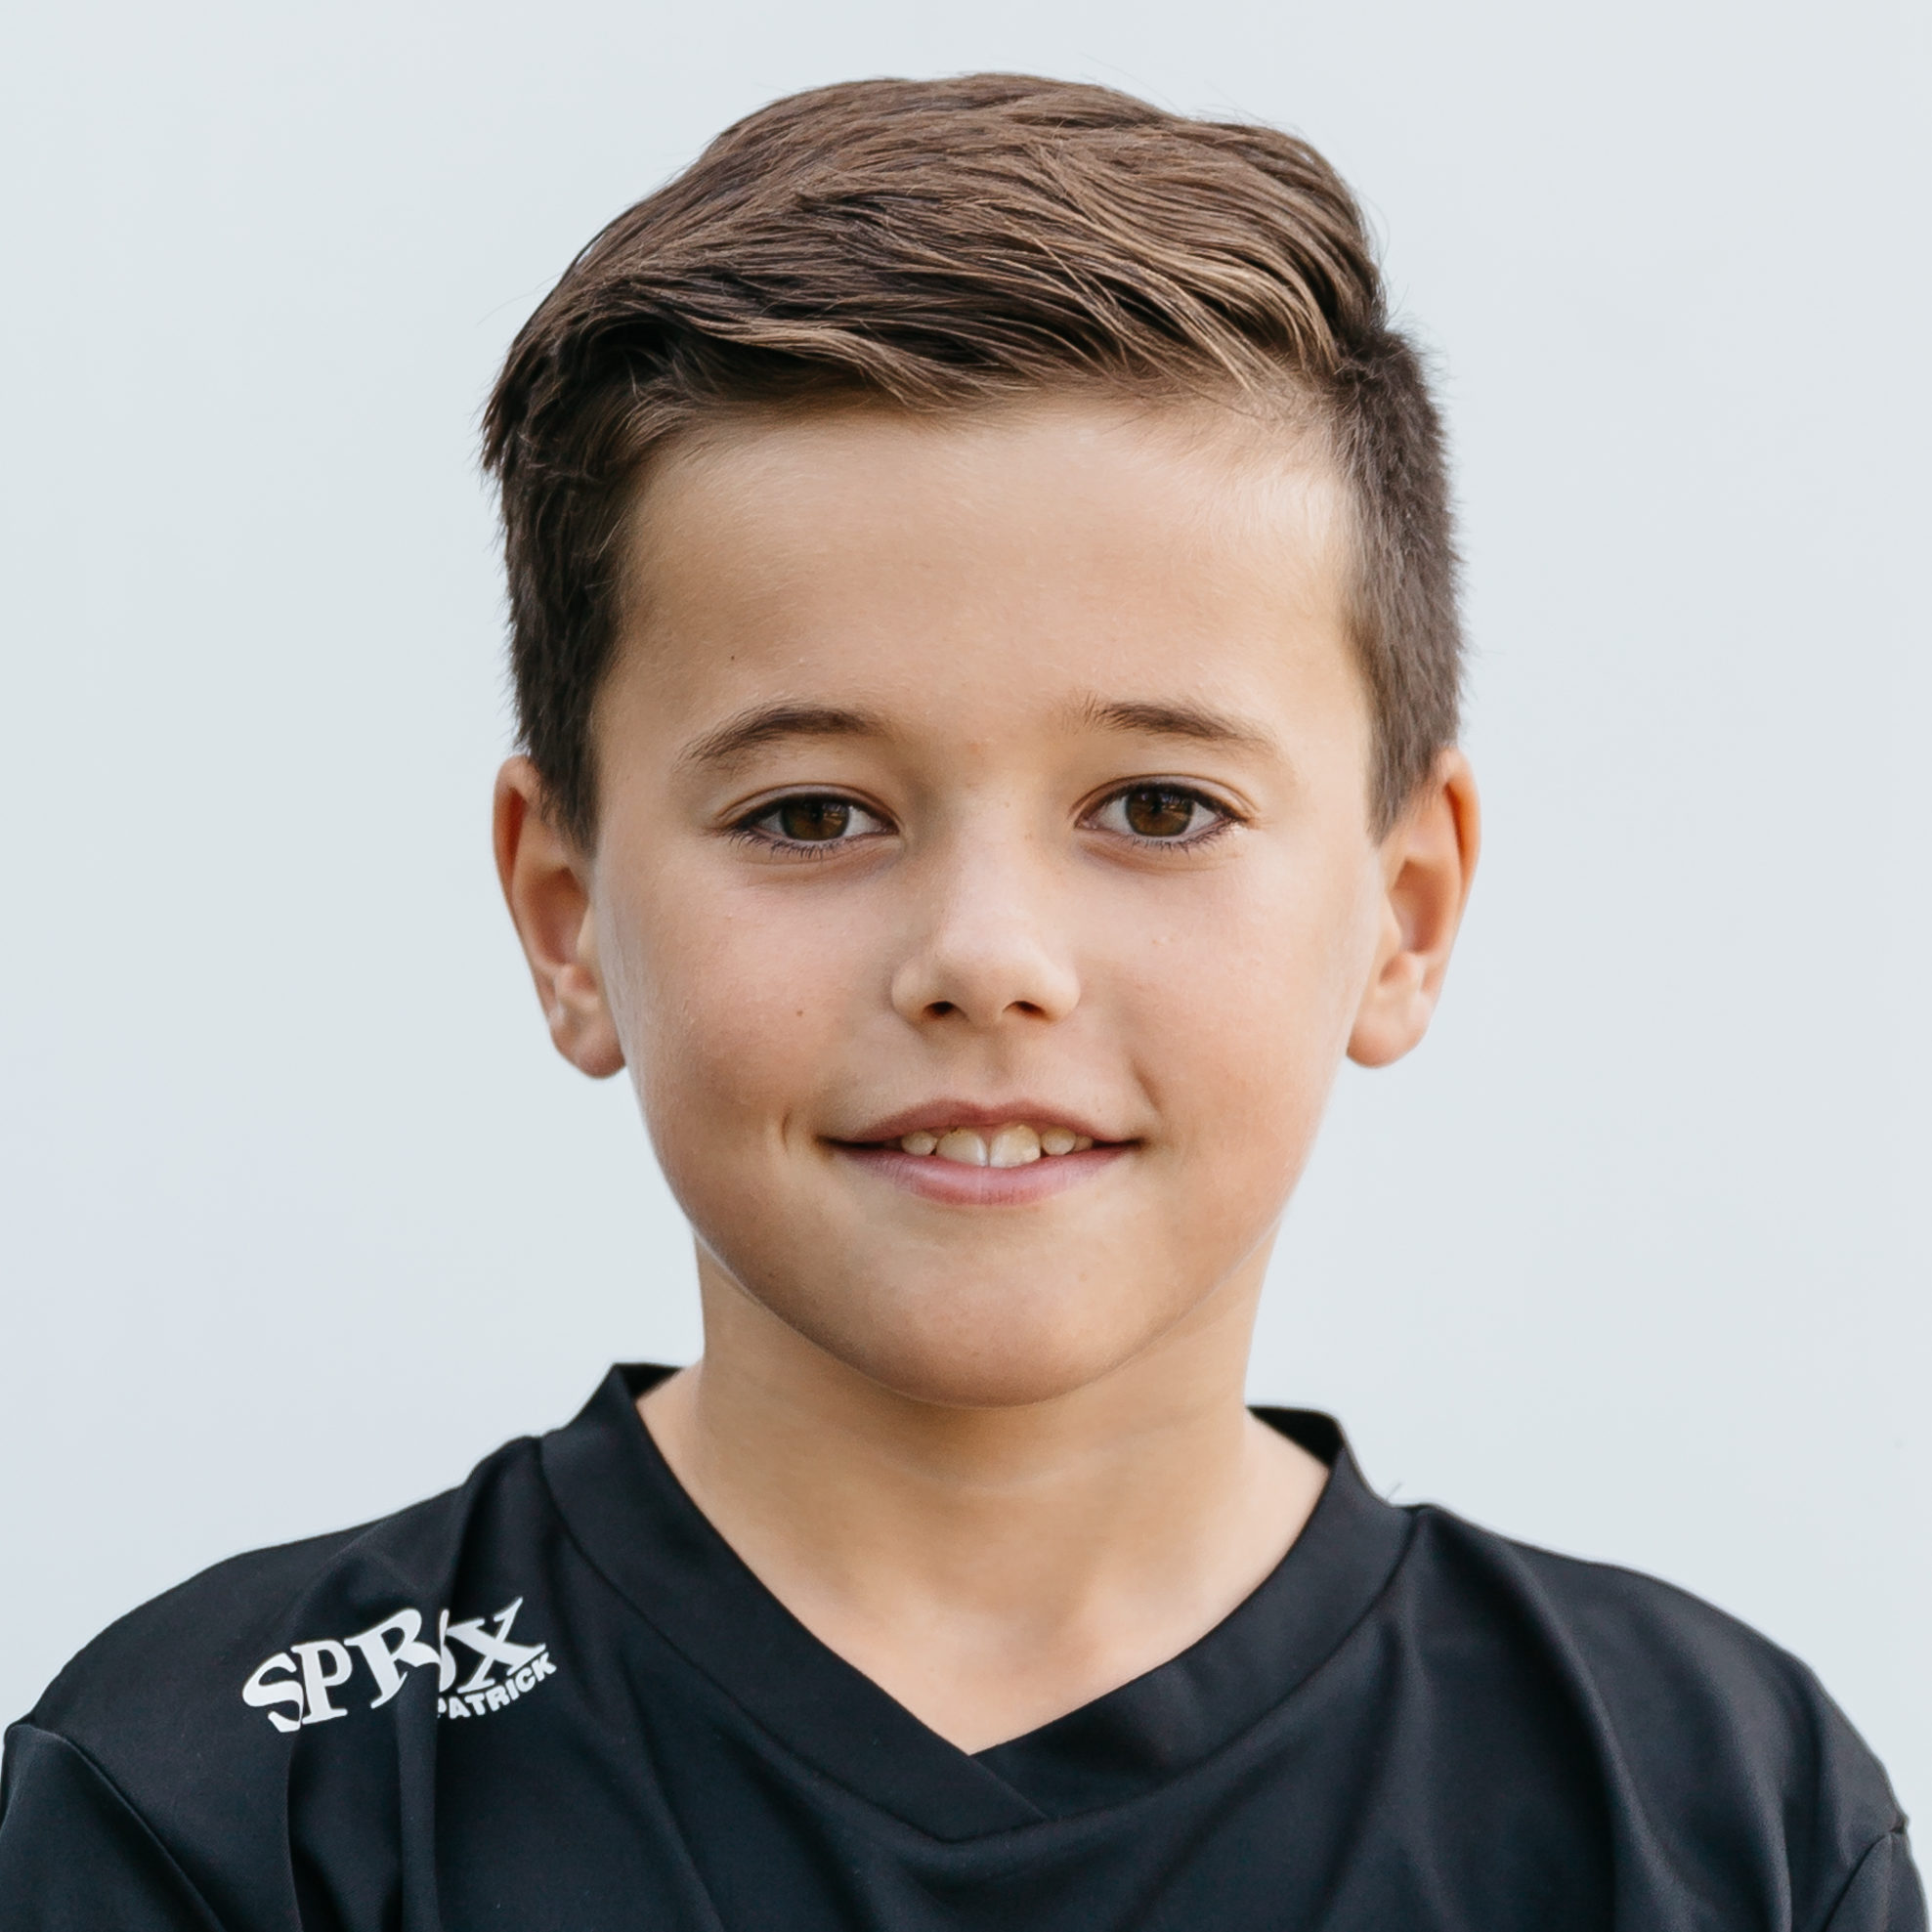 https://socceracademybreda.nl/wp-content/uploads/2017/05/SAB-Quint-1-e1568185104693.jpg